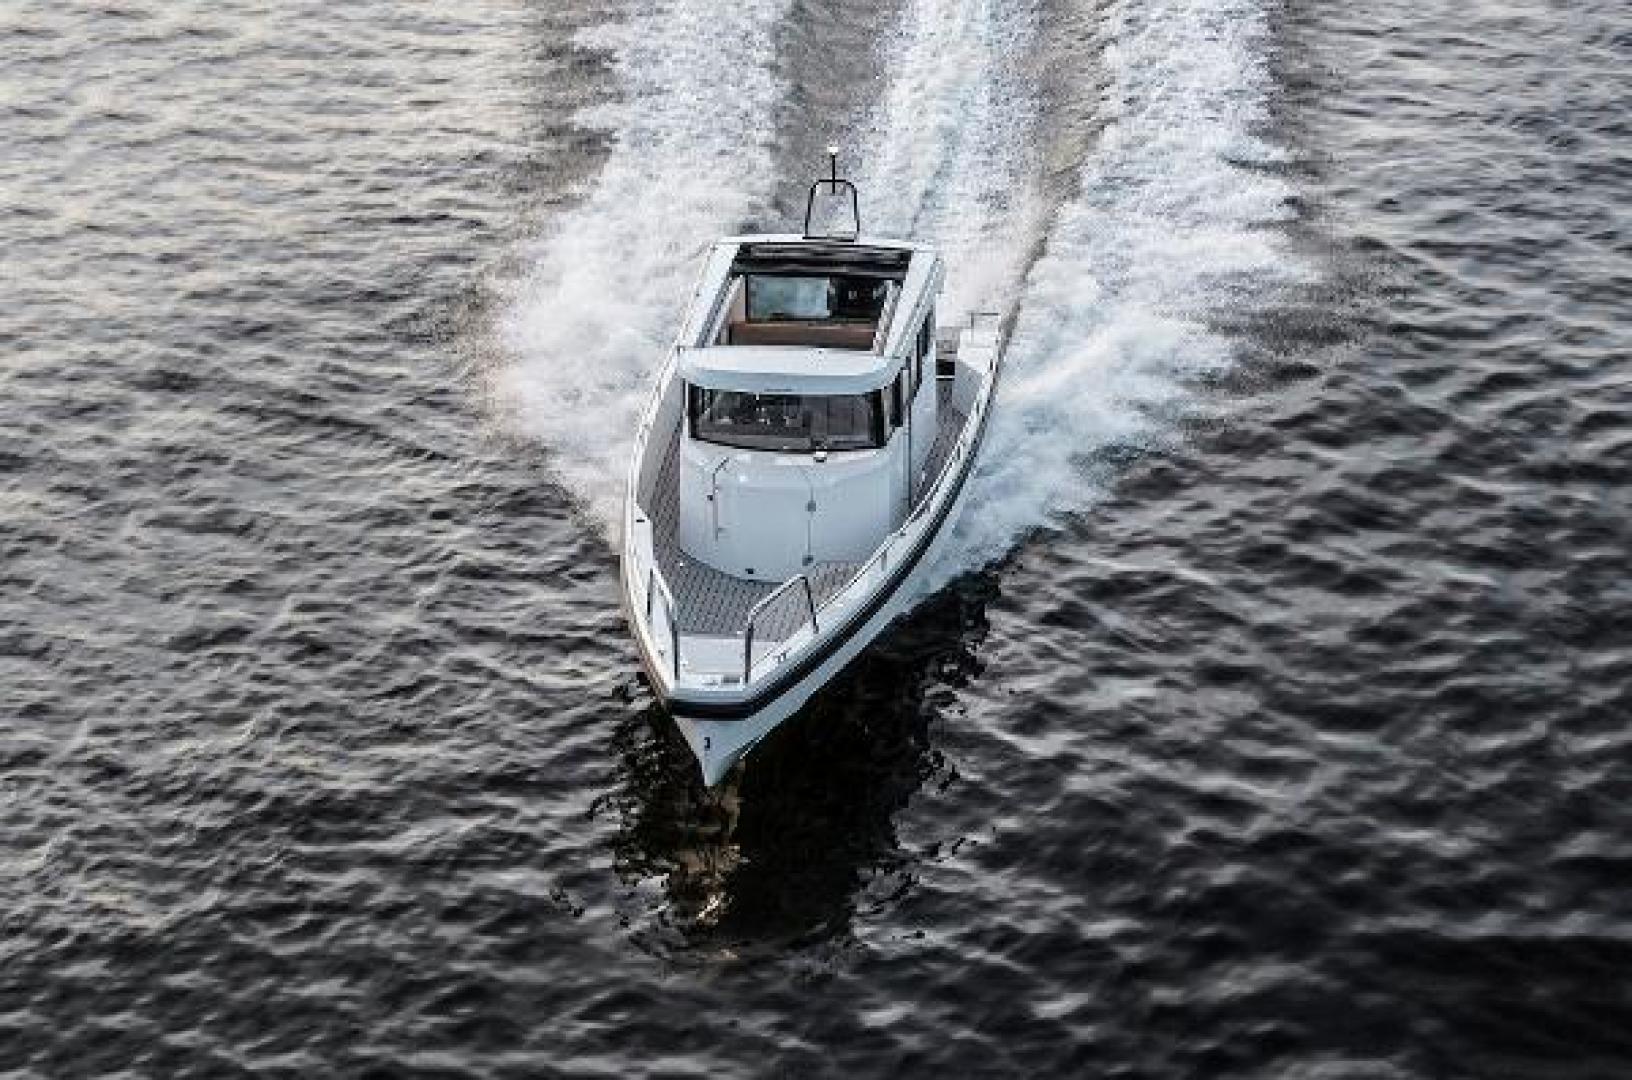 Axopar-28 CABIN 2021-Axopar 28 CABIN Sarasota-Florida-United States-1531528 | Thumbnail